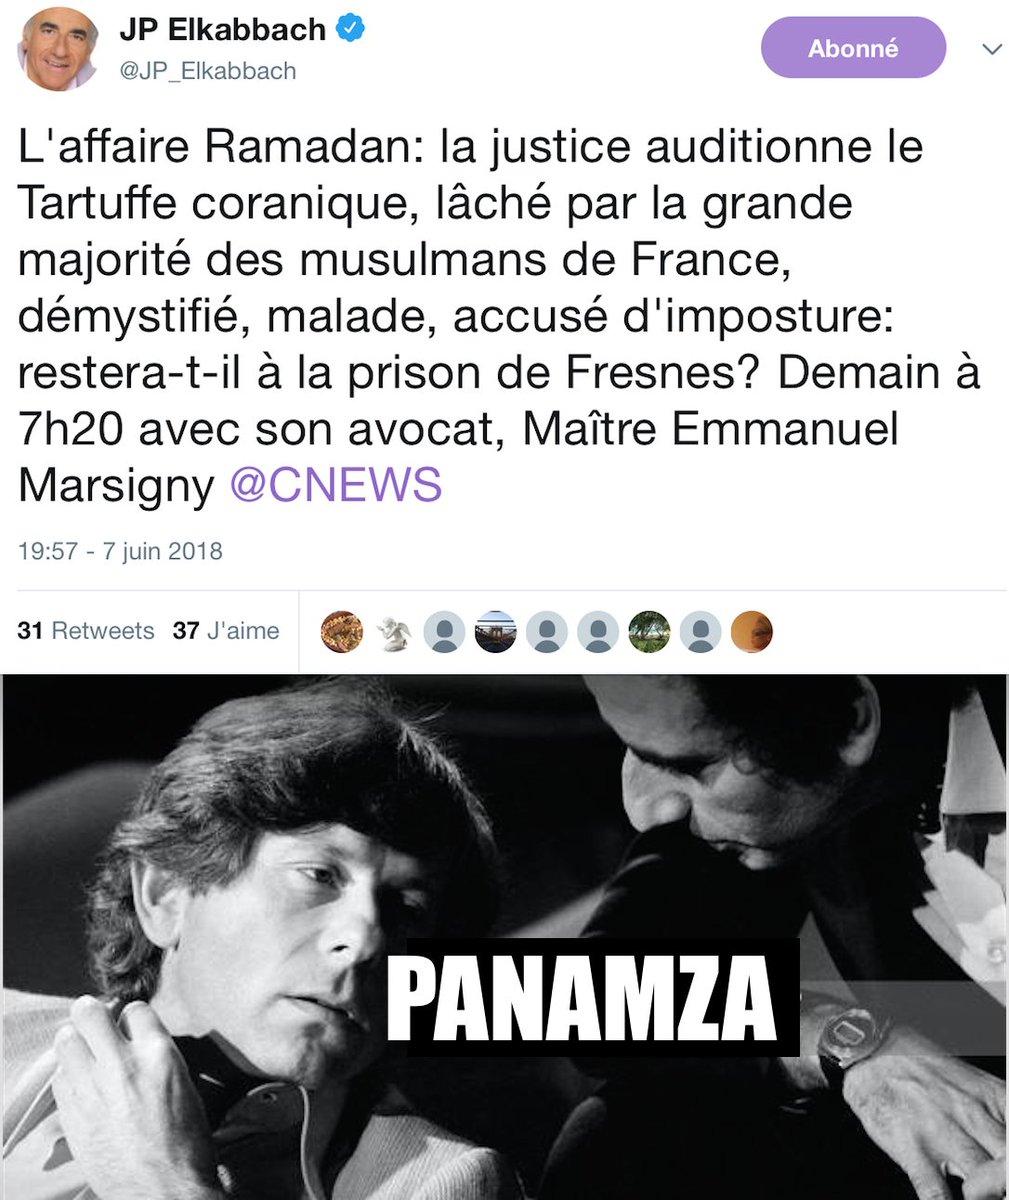 Elkabbach : dur avec Ramadan, tendre avec Polanski